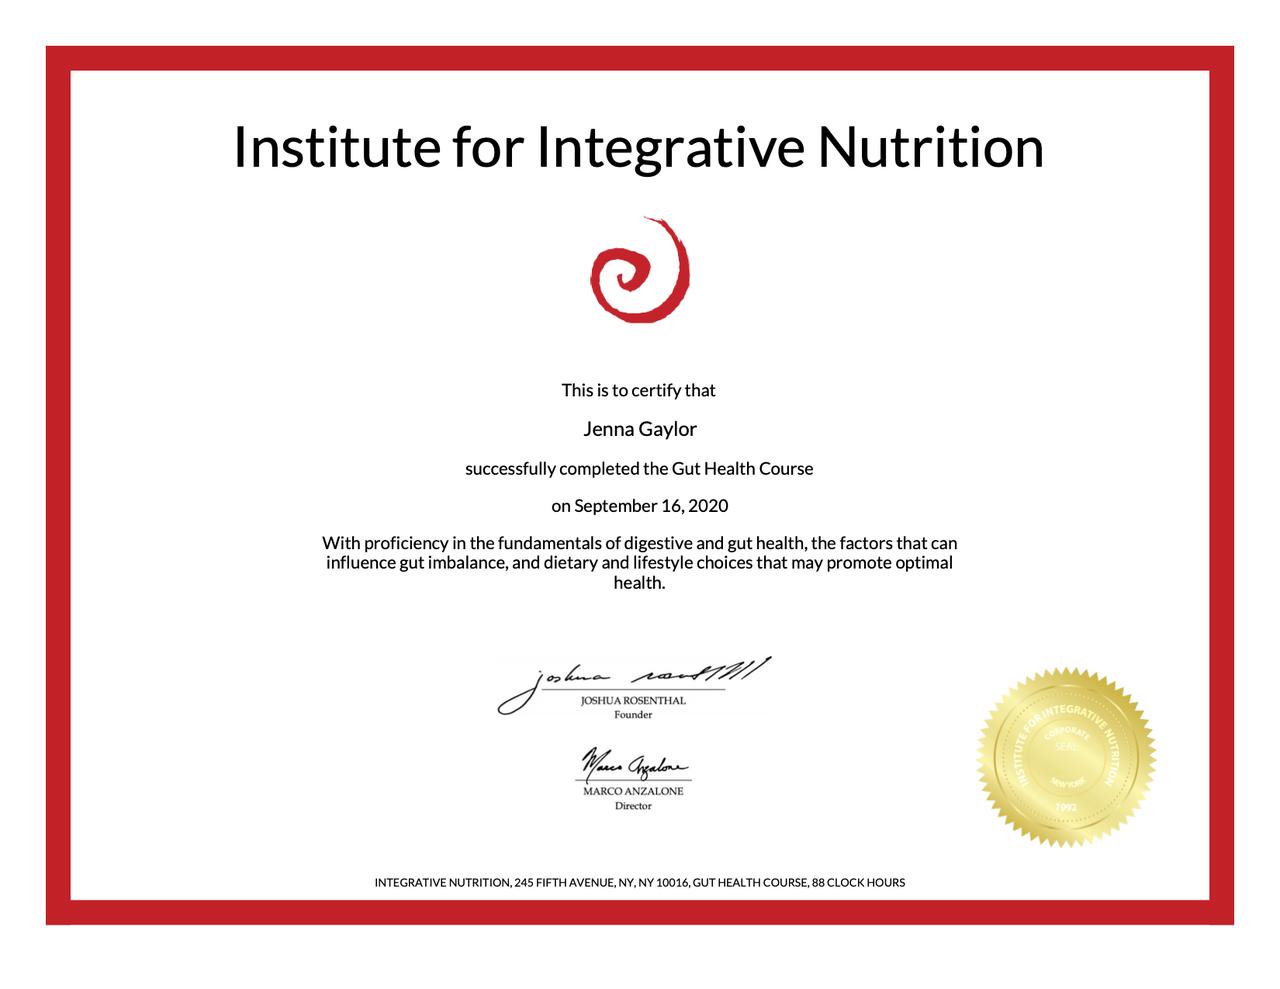 gut_health_certificate (1).png